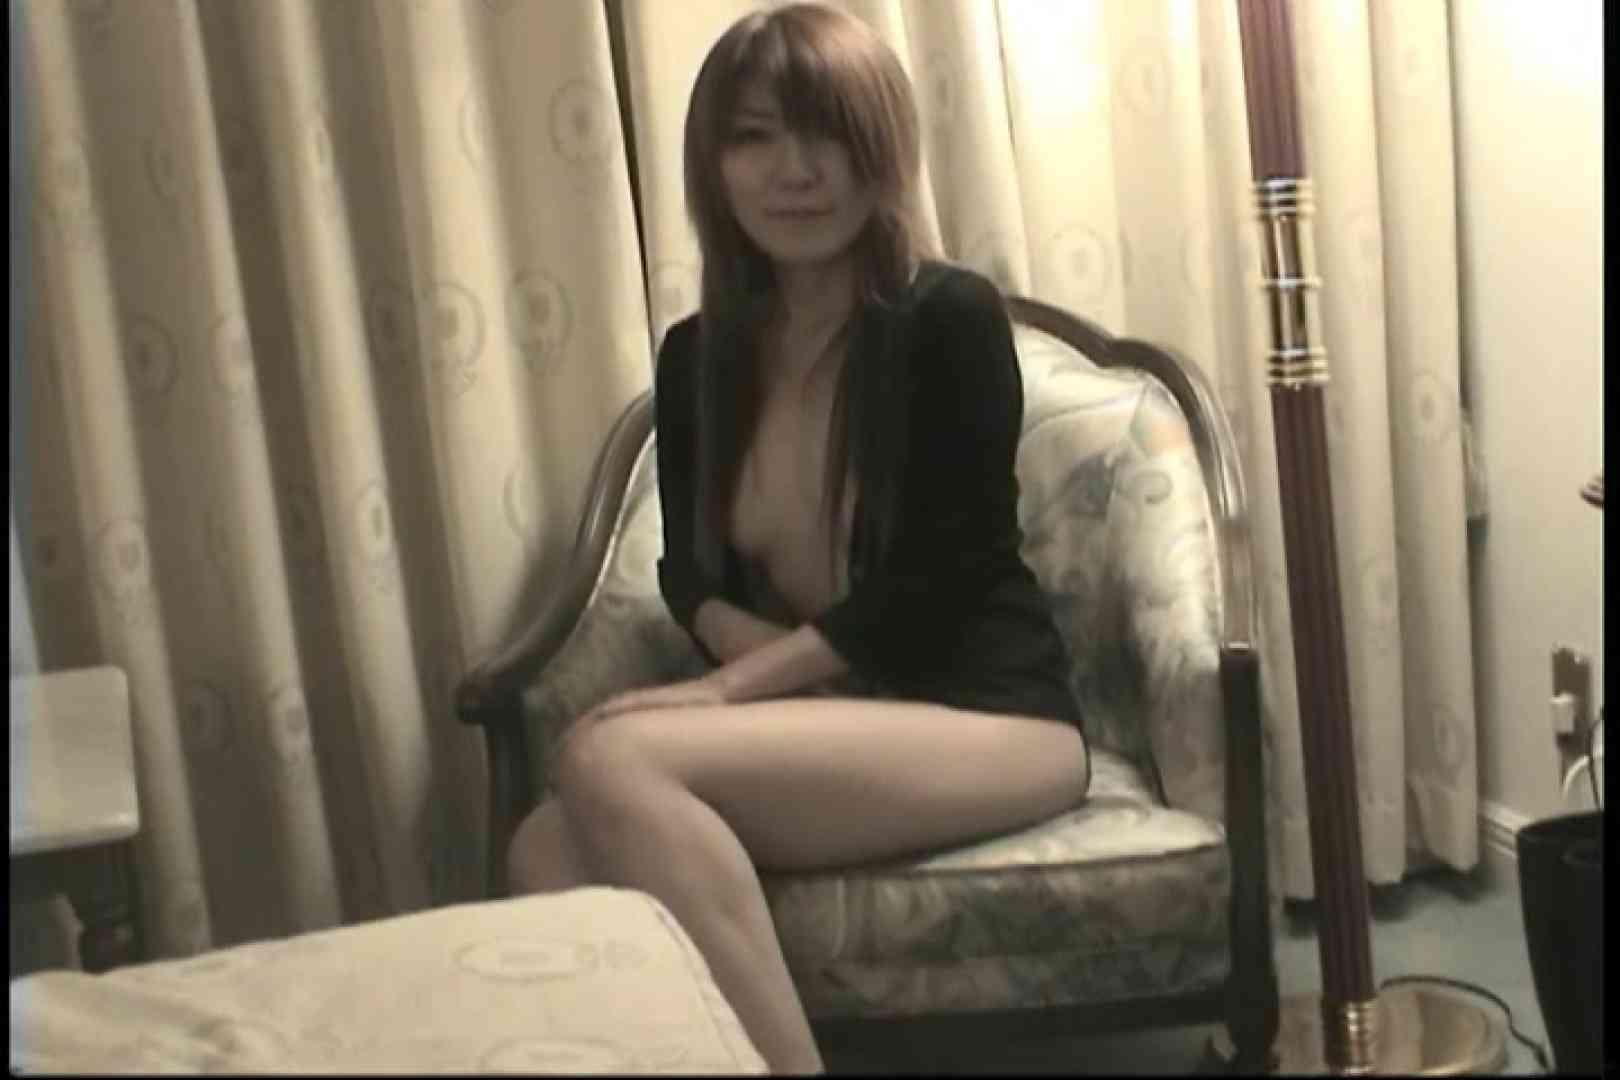 H大好きな清楚系の美ボディお姉さんとホテルでSEX~安西みか~ 熟女   ホテル  104枚 21